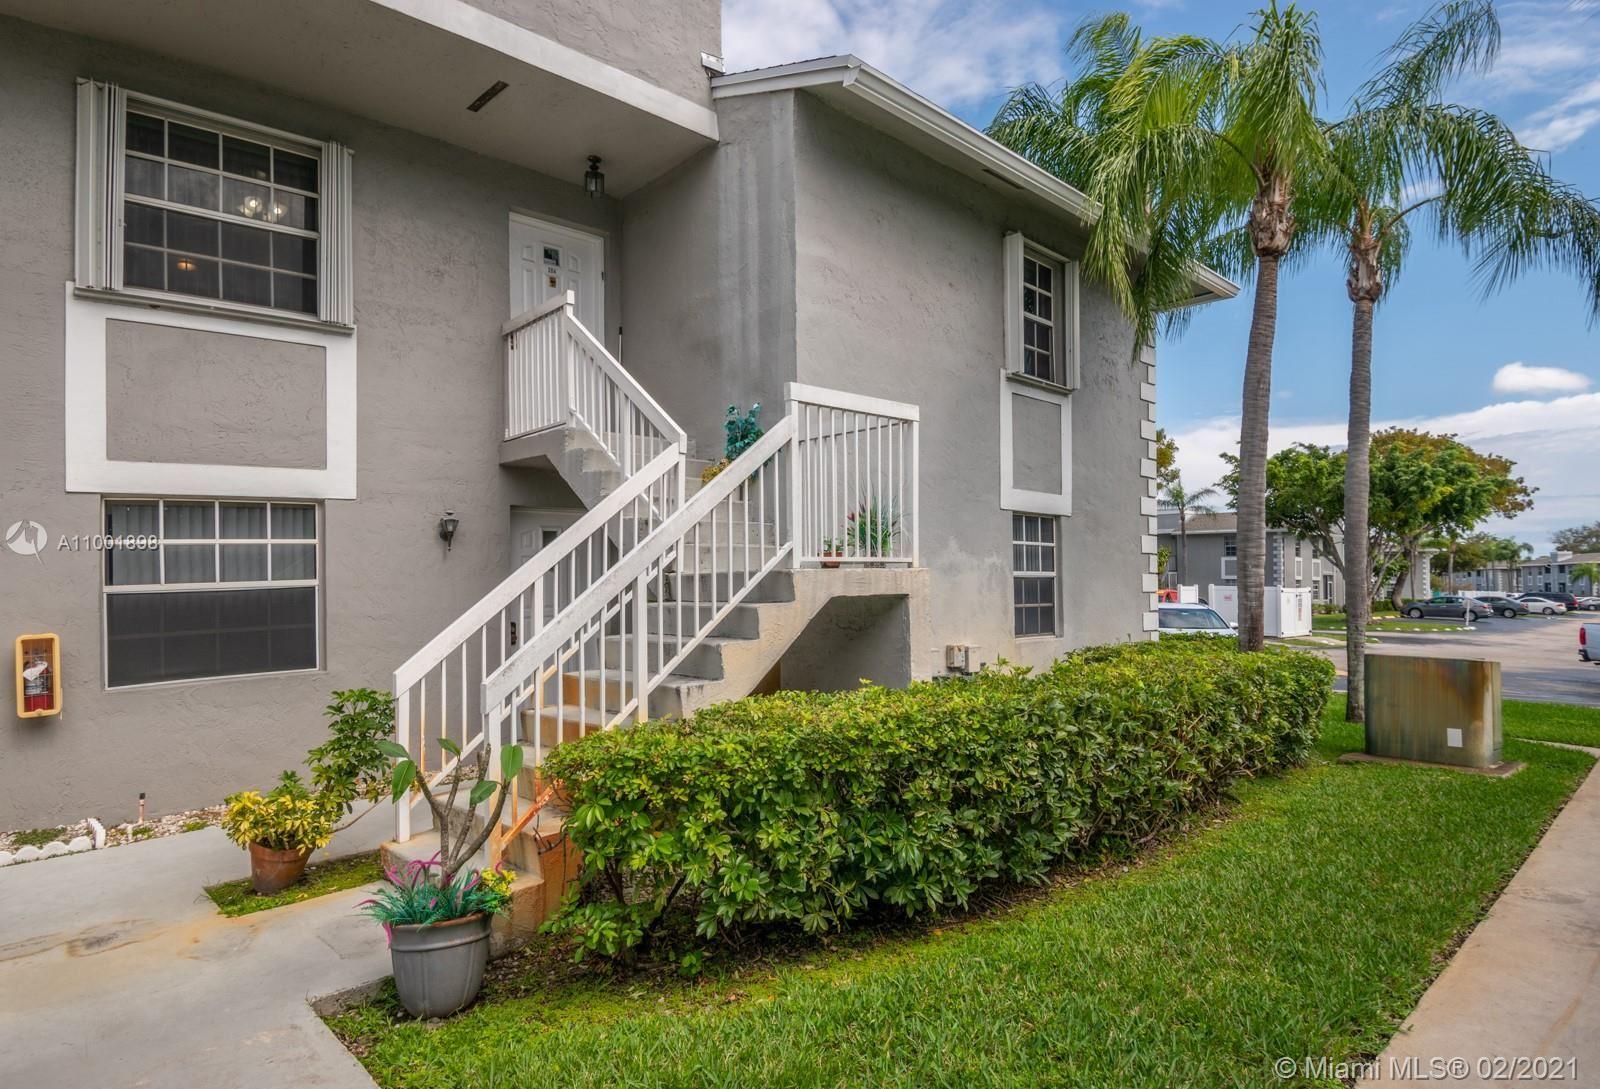 446 NE 210 Circle Terrace #204-6A, Miami, FL 33179 - #: A11001898